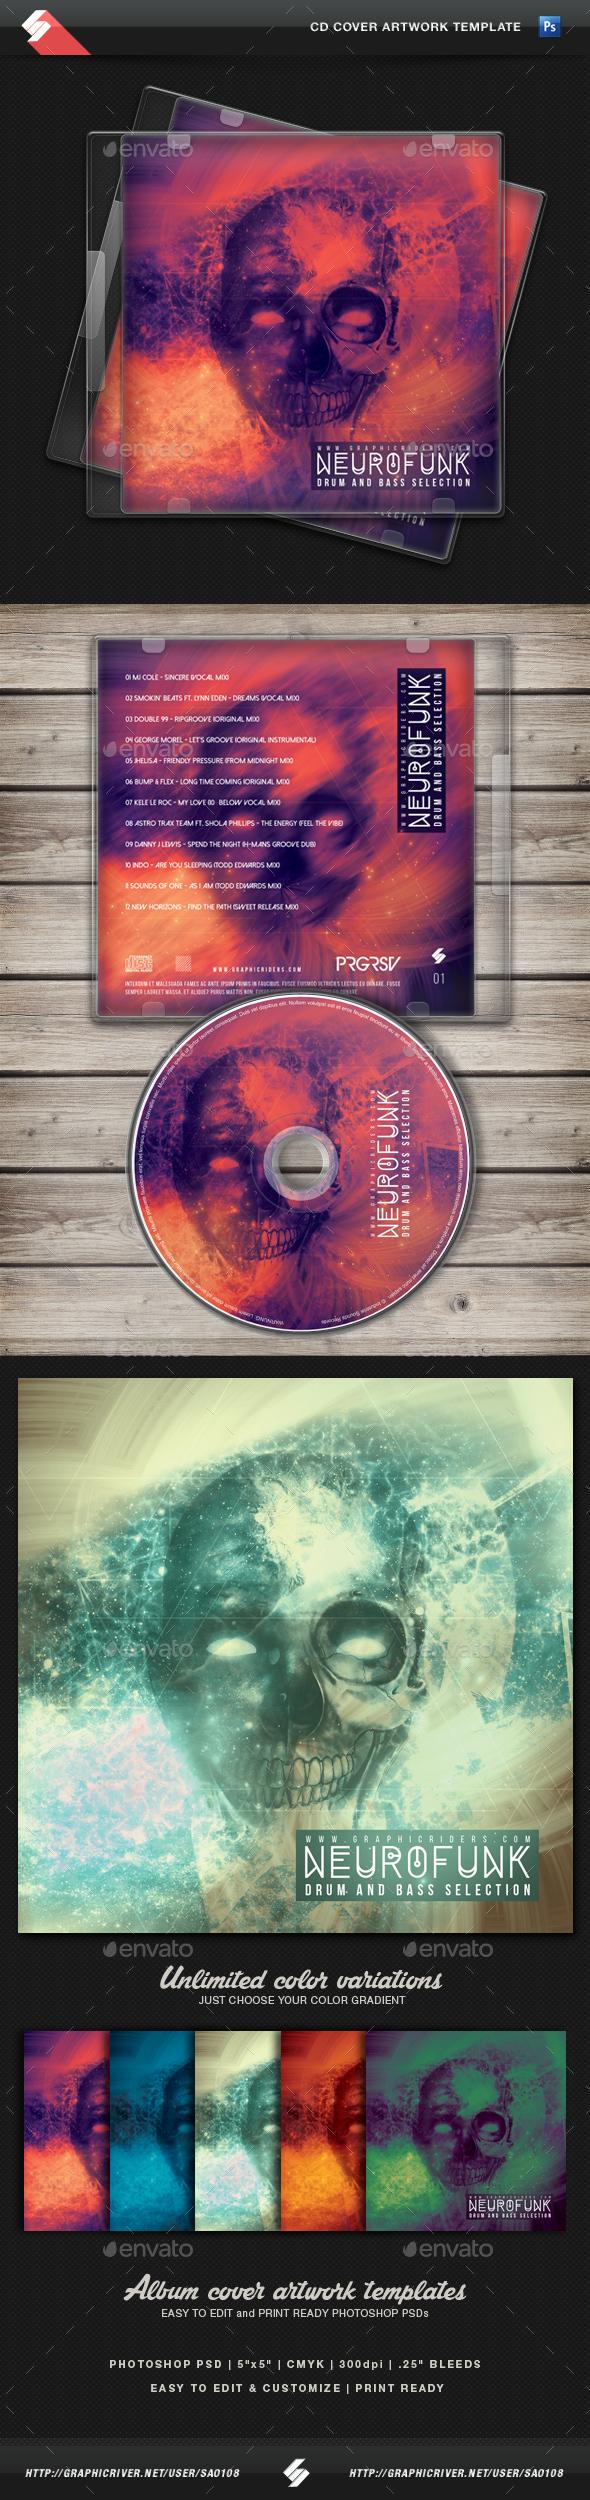 Neurofunk - Hardcore CD Cover Template - CD & DVD Artwork Print Templates